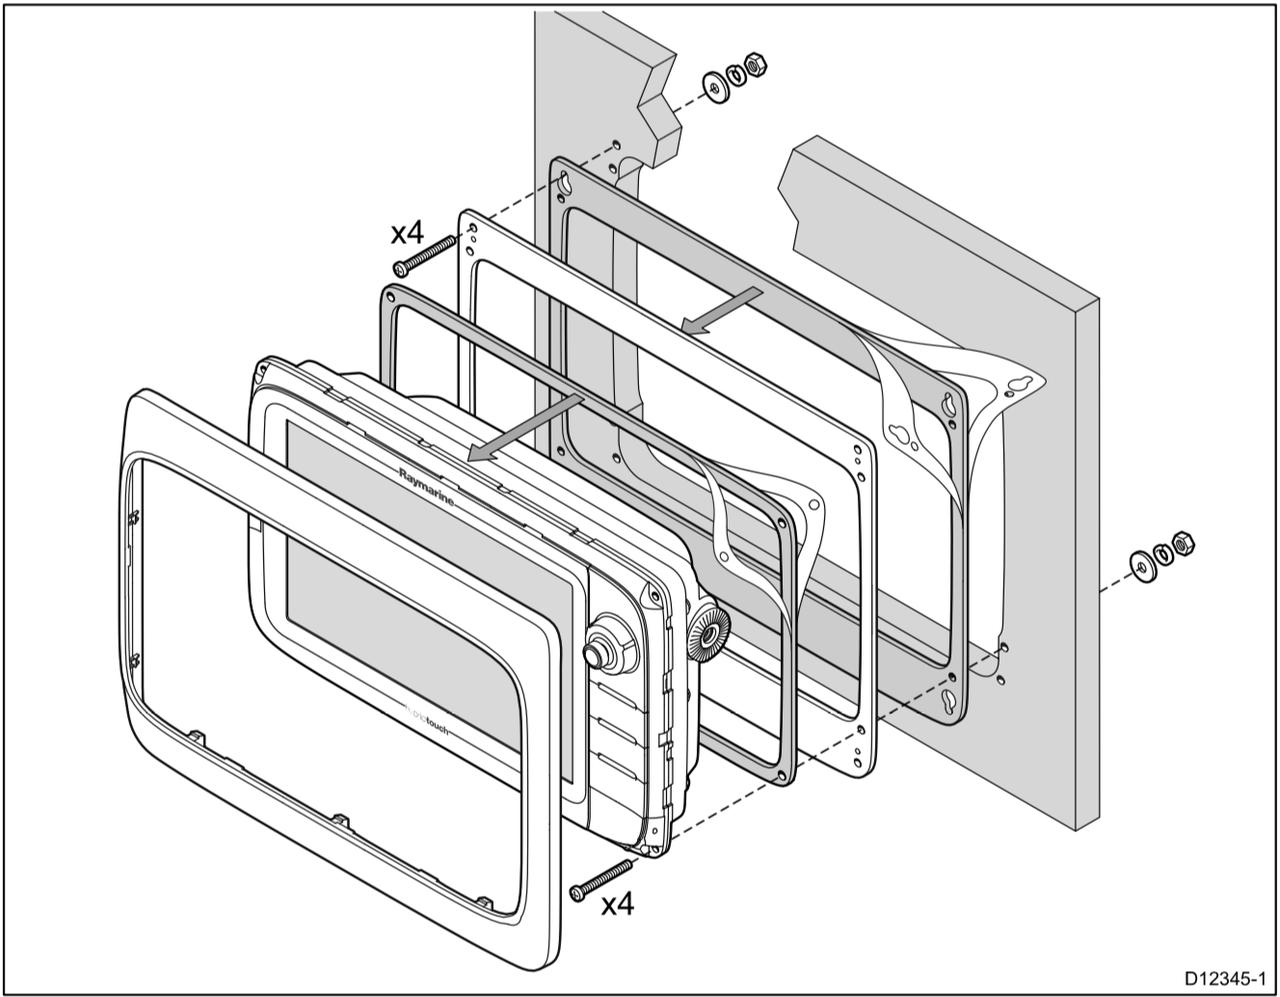 medium resolution of c80 wiring diagram wiring diagram third level c80 wiring diagram